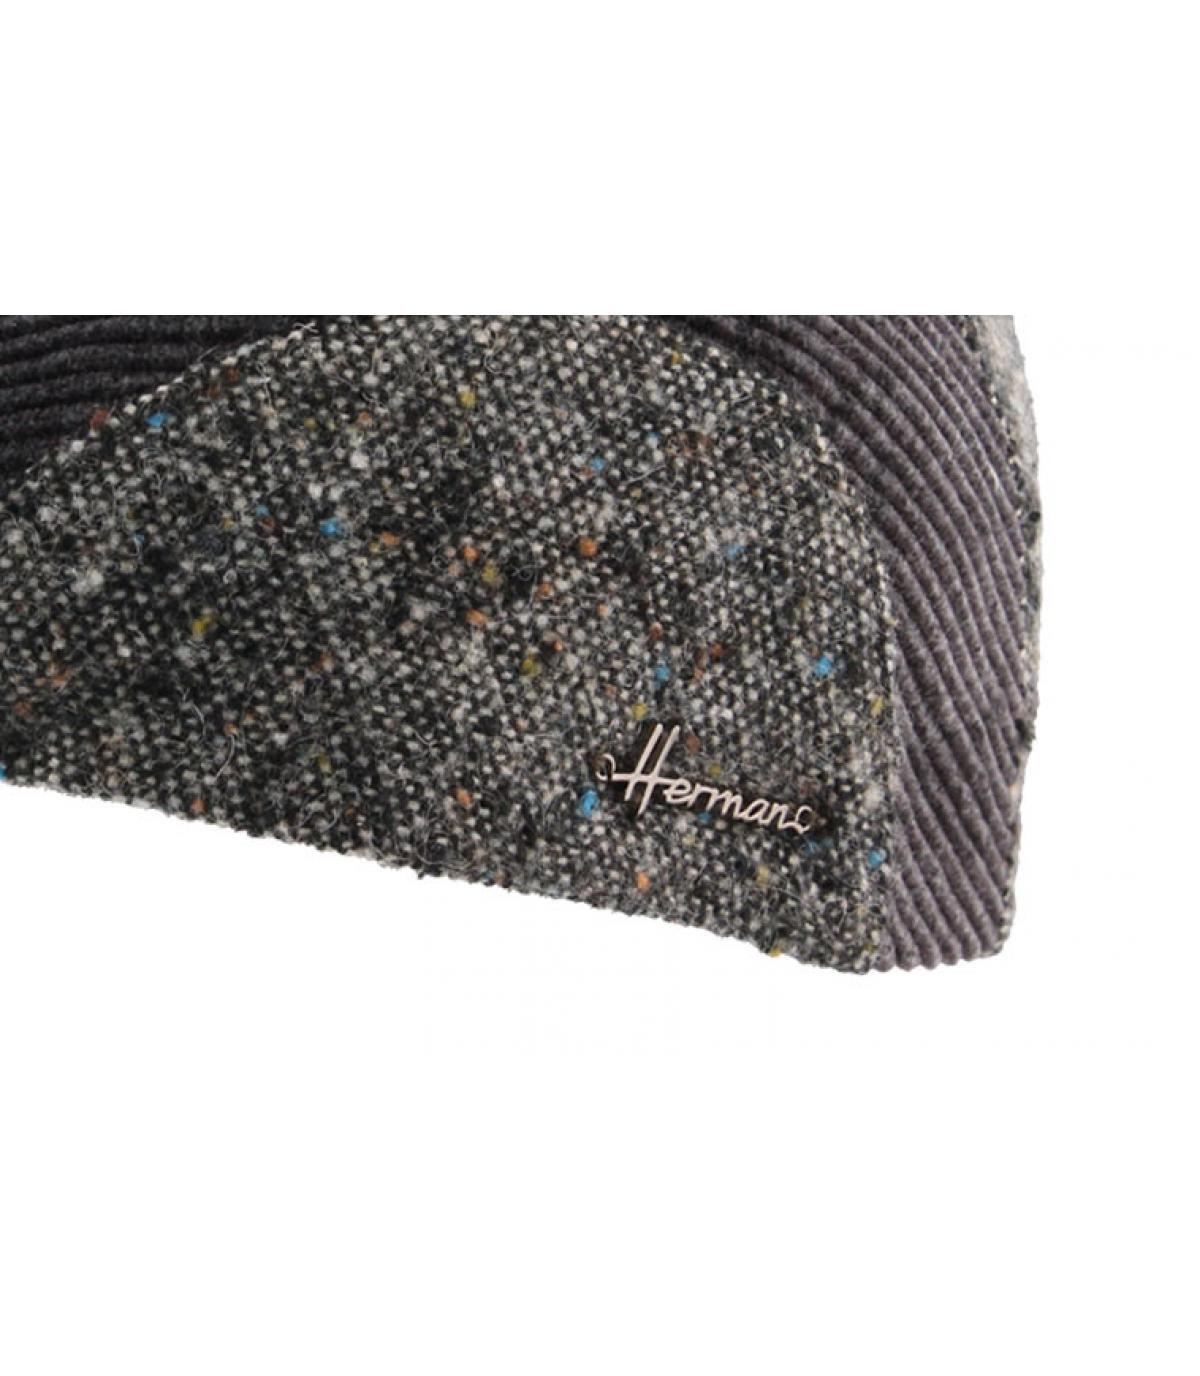 Details Range Wool Corduroy grey - Abbildung 3